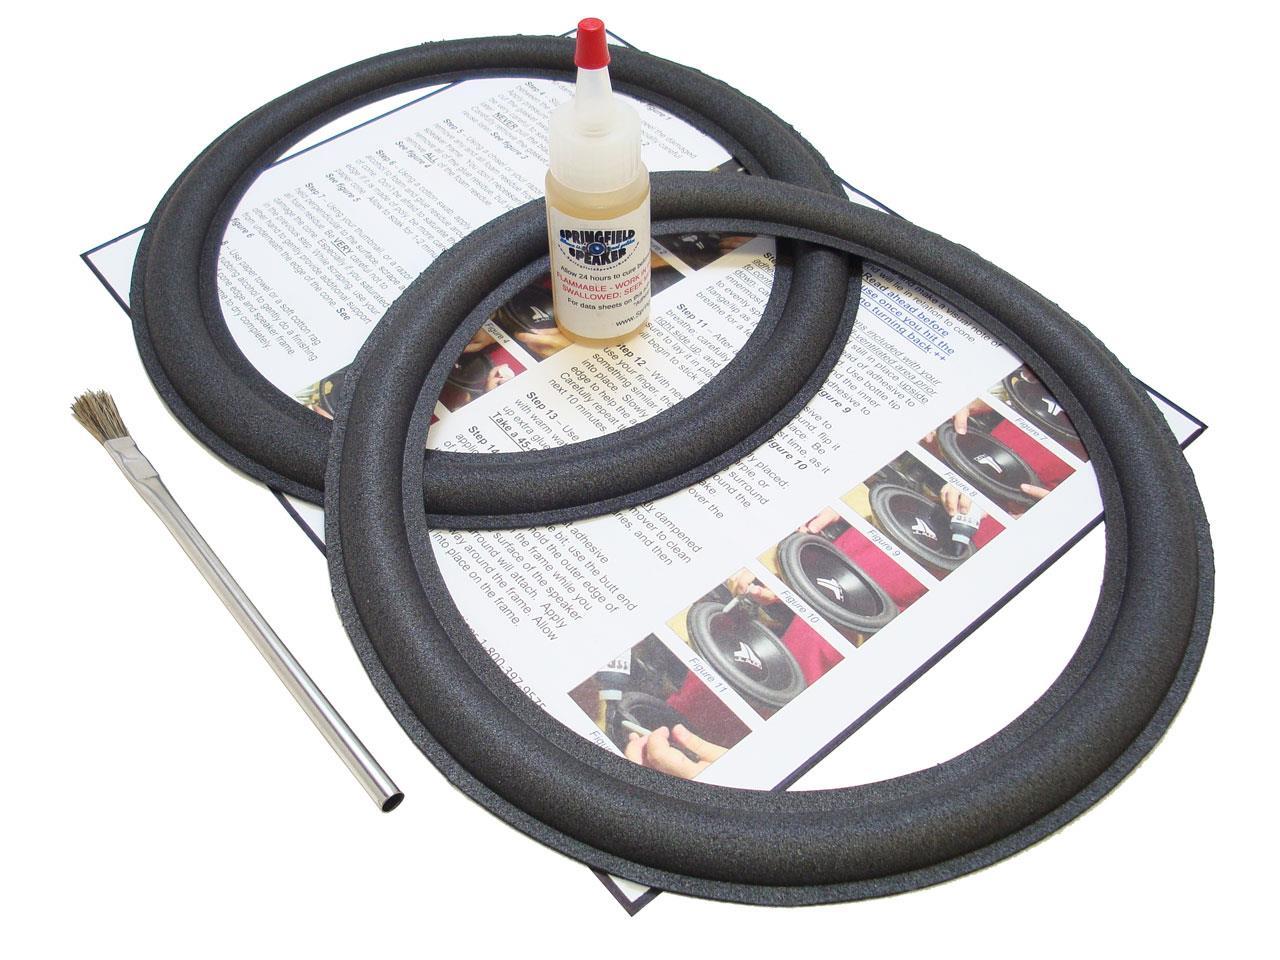 advent 10 10990536 speaker foam repair kit 10990605 a2. Black Bedroom Furniture Sets. Home Design Ideas